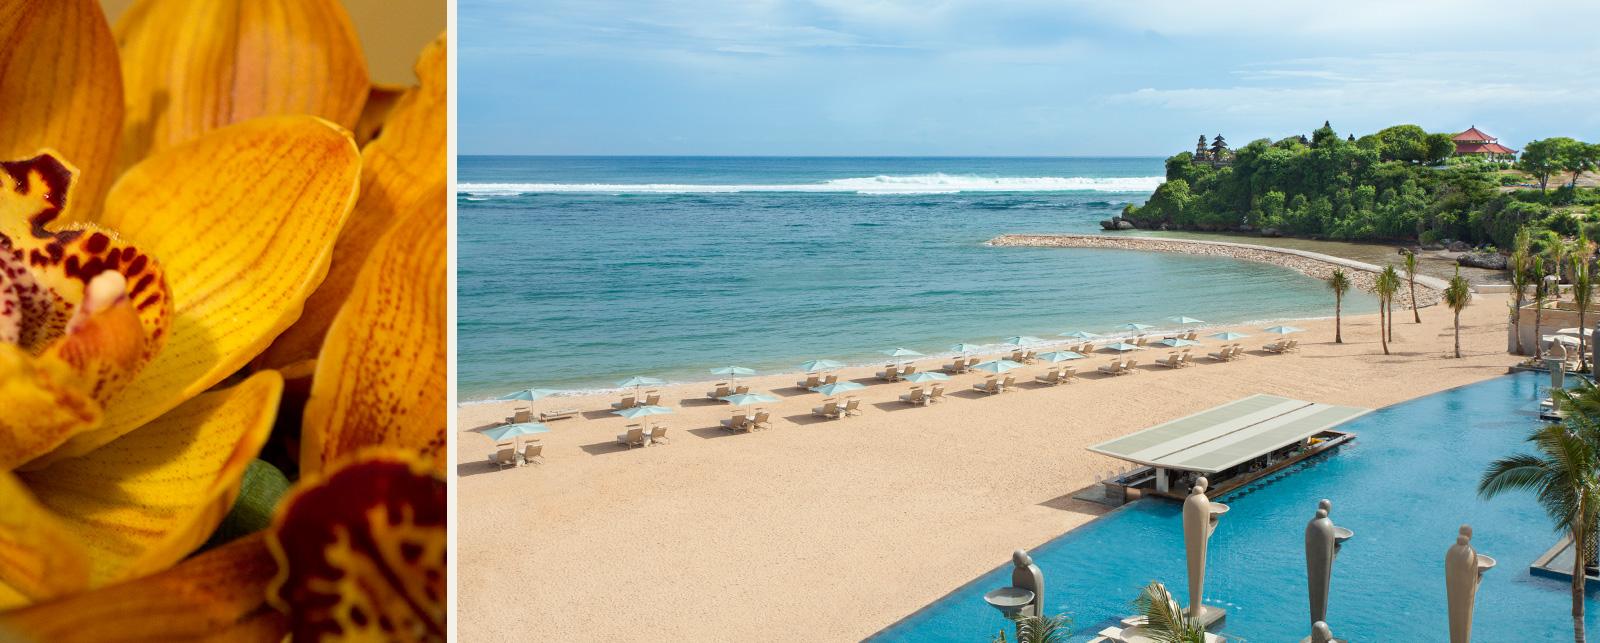 Luxury Resort In Nusa Dua